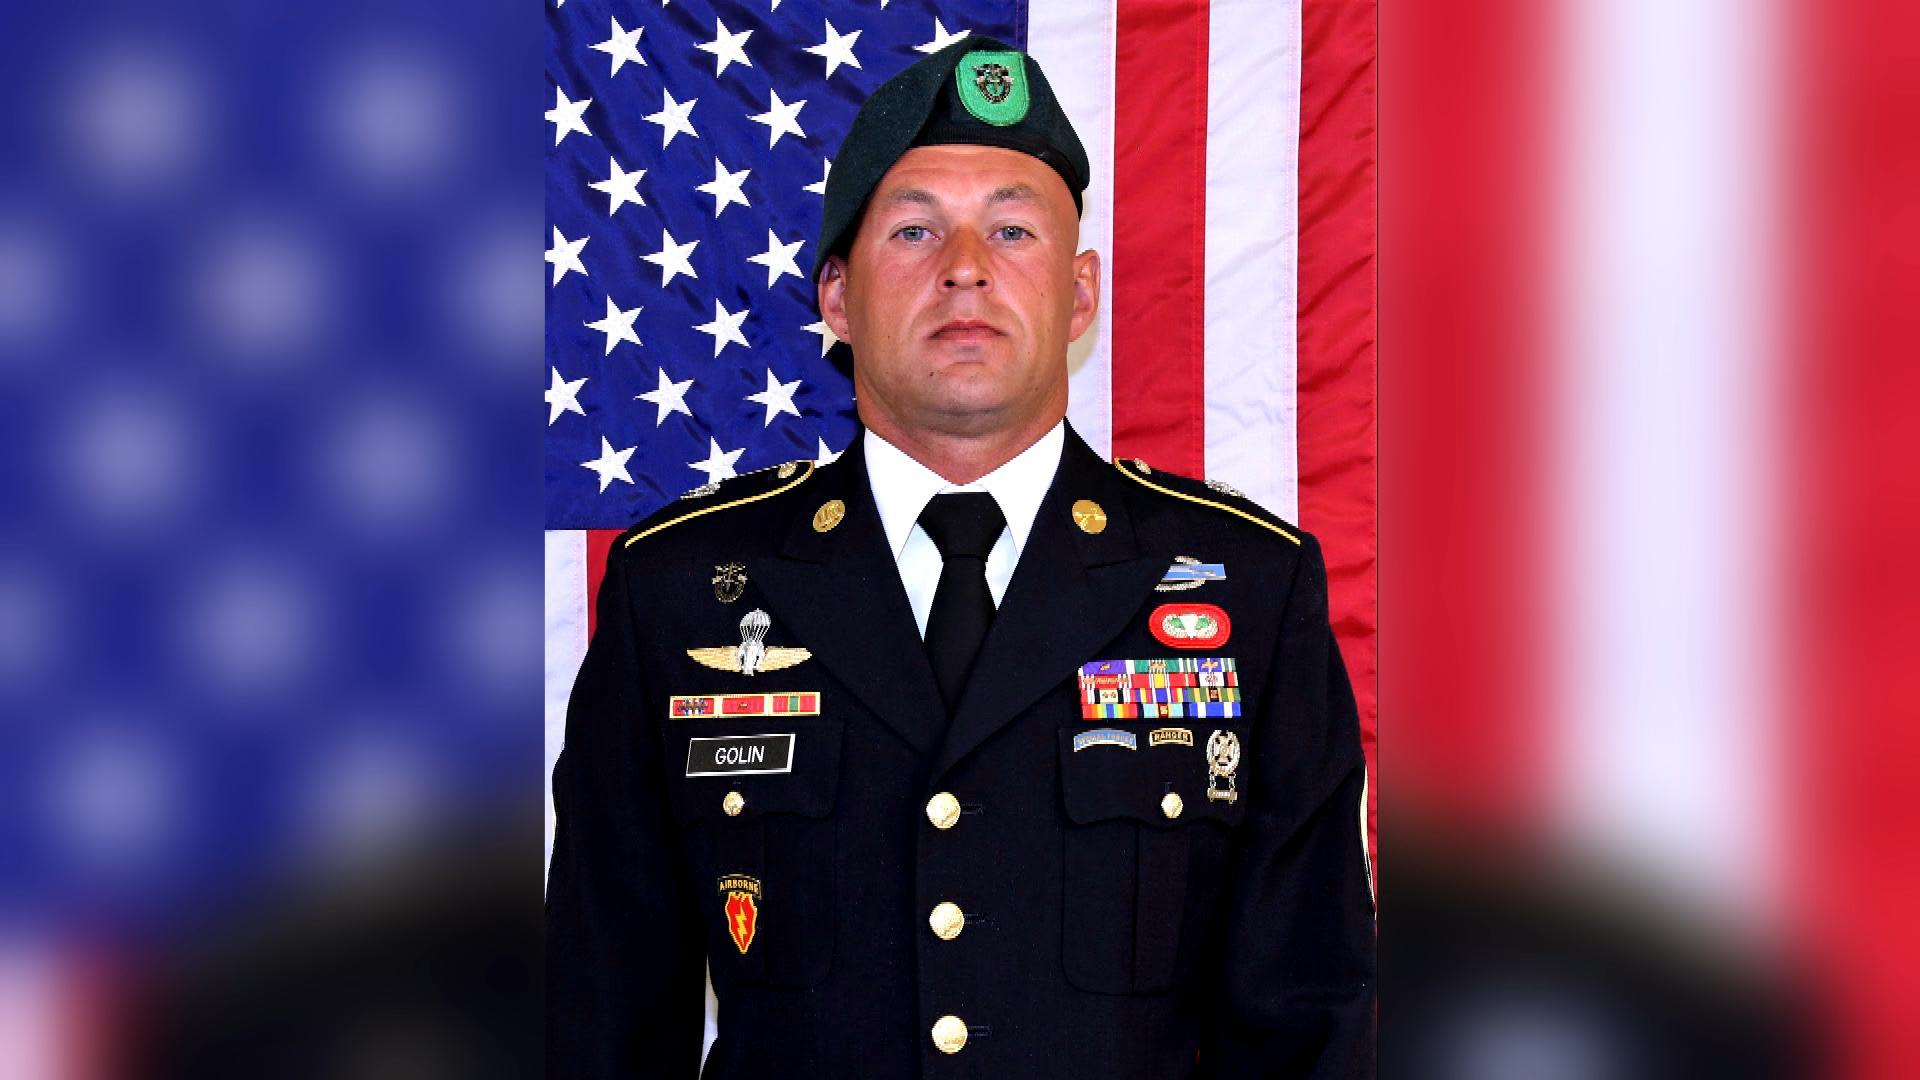 Pentagon releases name of U.S. soldier killed in Afghanistan